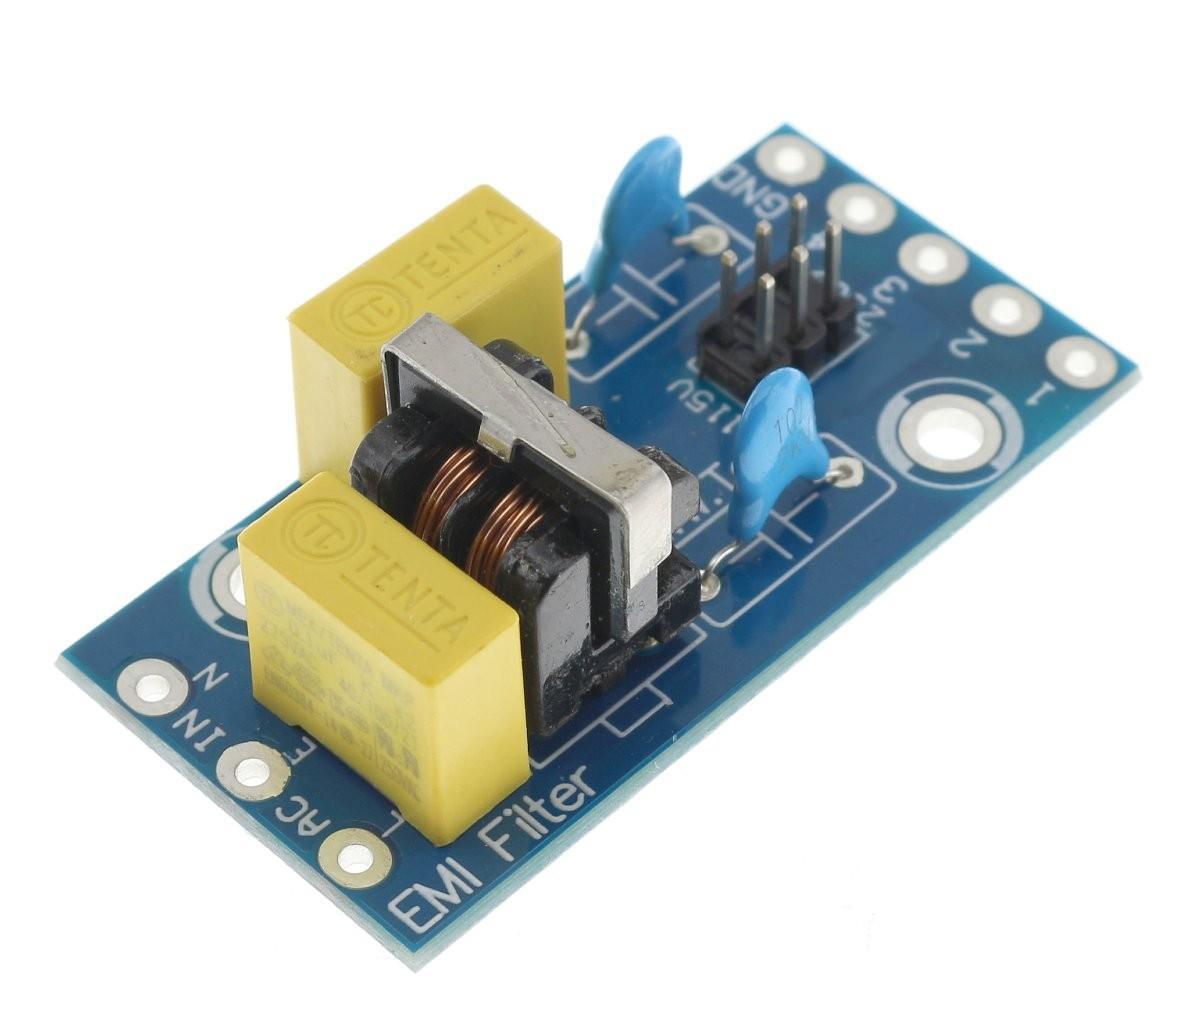 EMI / RFI mains filter Interference suppression 230V 1A